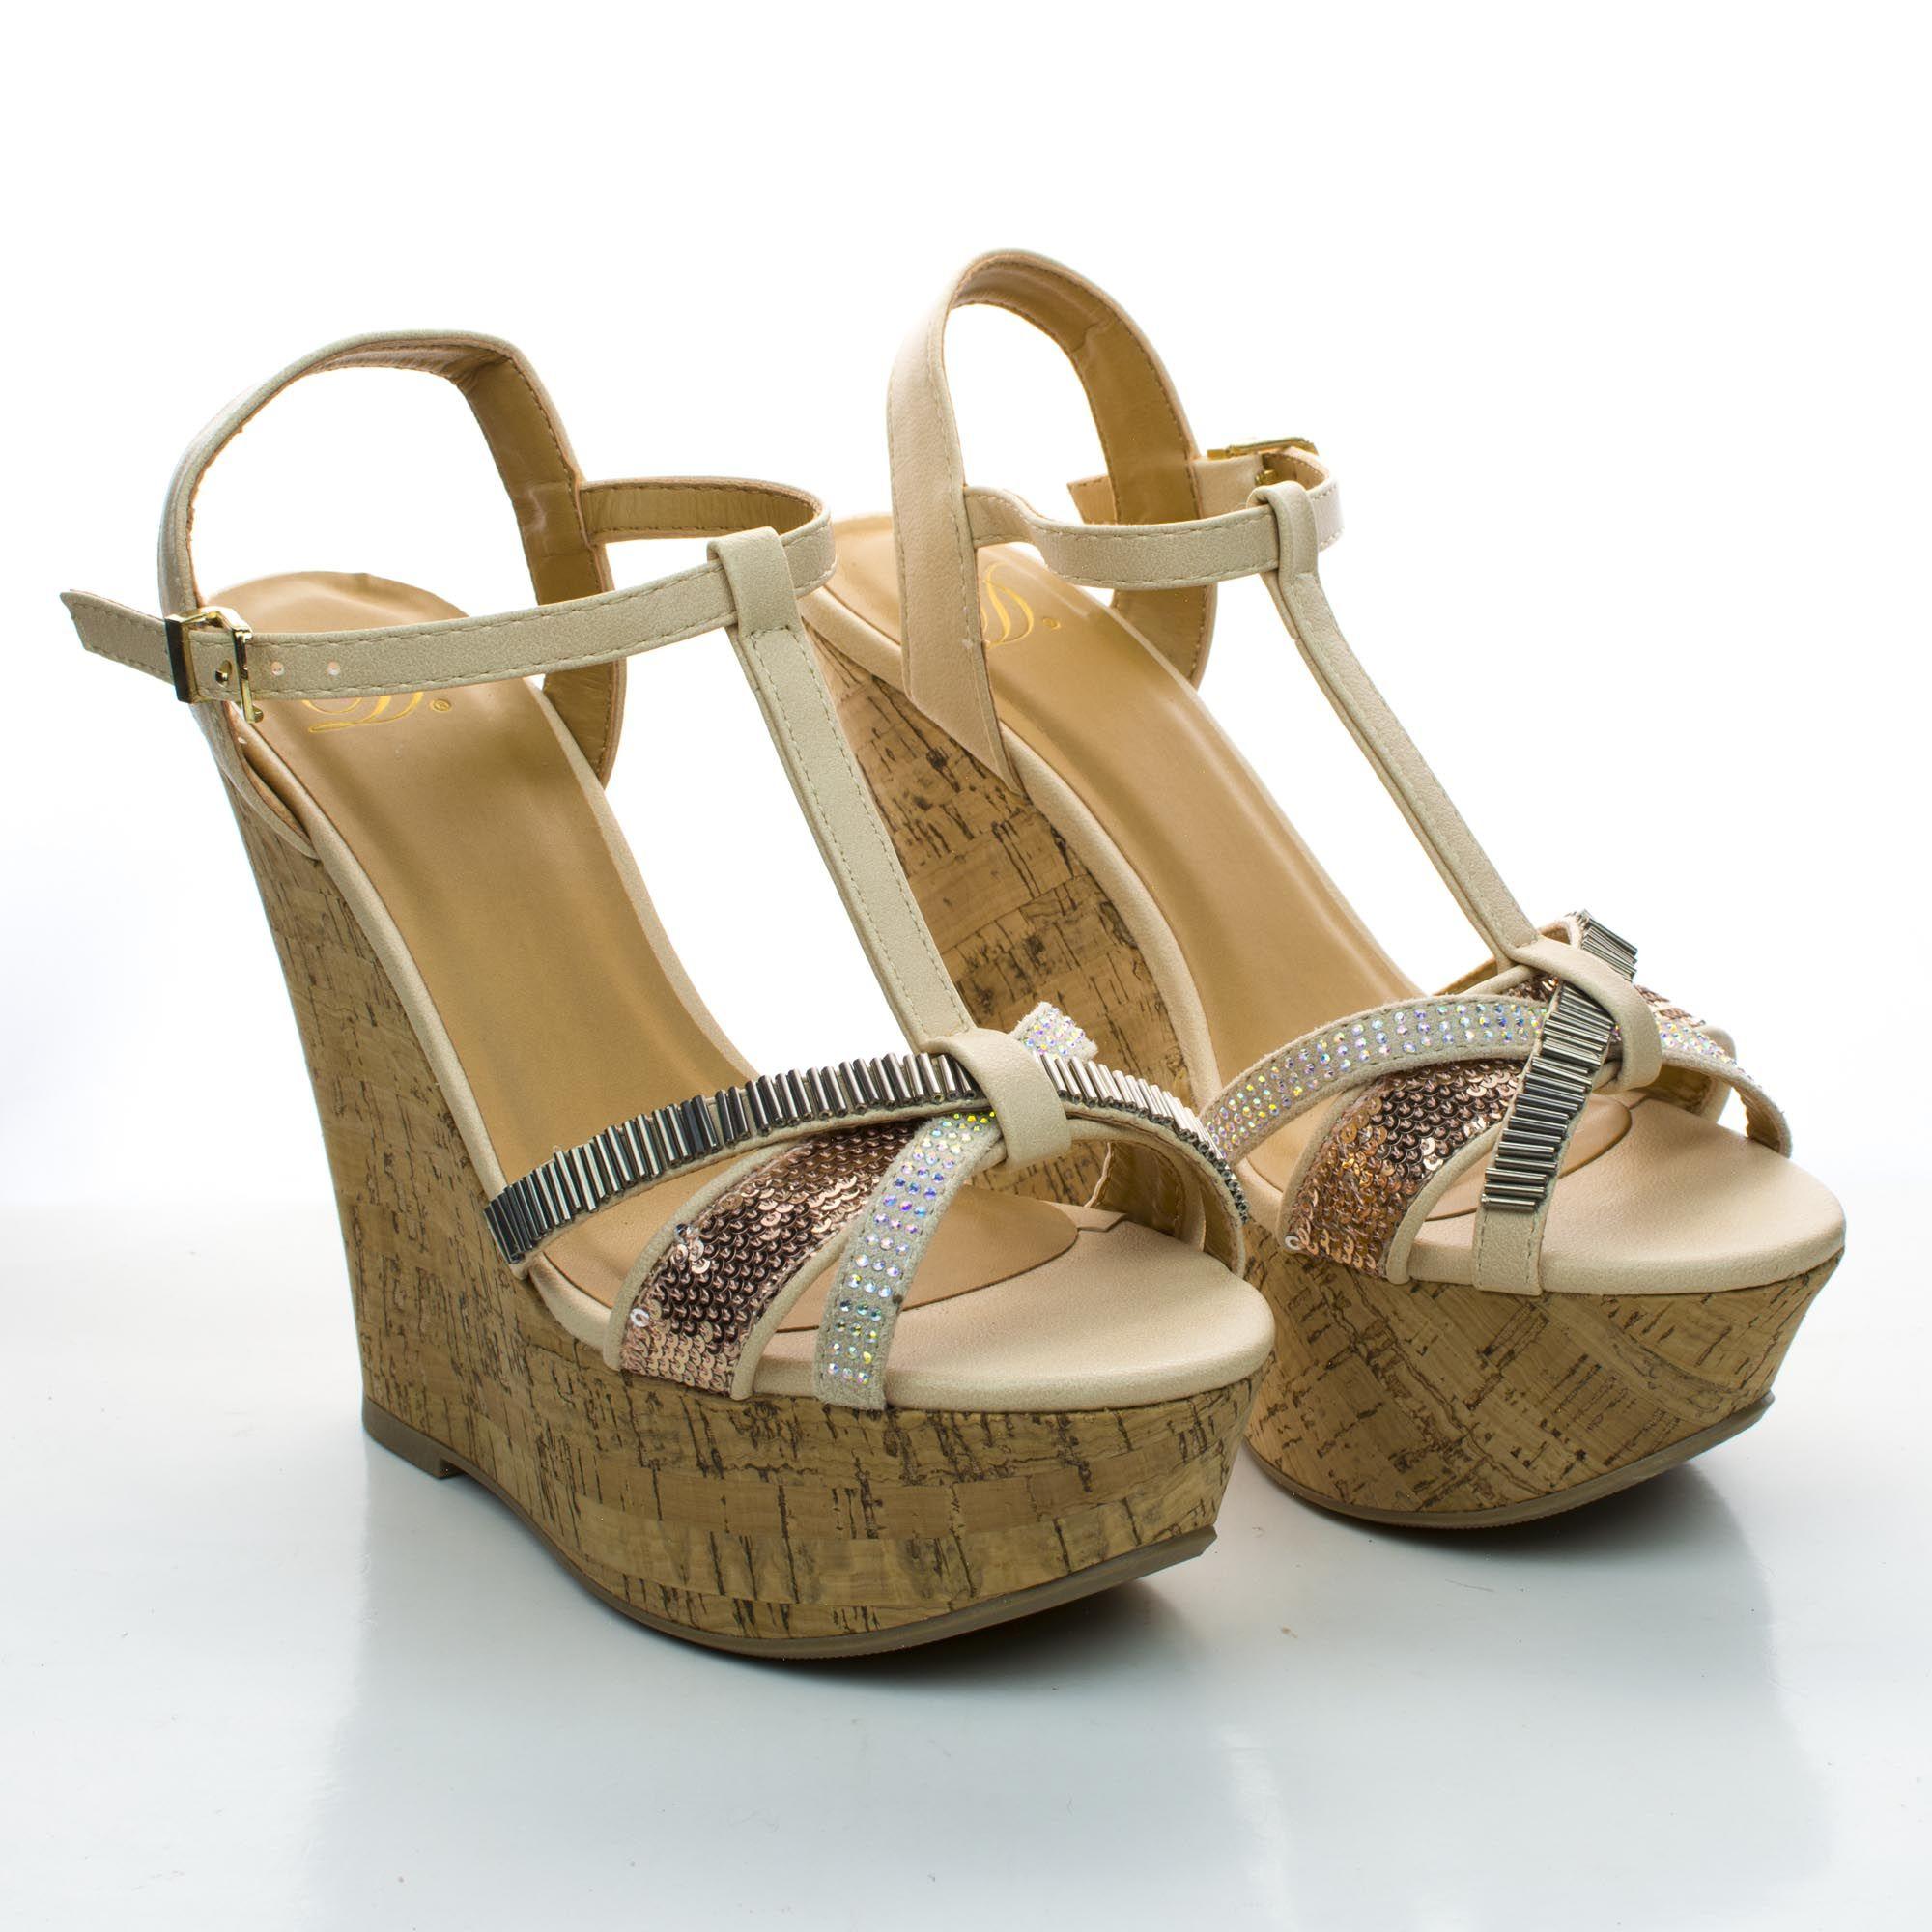 Gemeza Boho Platform Wedge Sandal Tribal Beads & Rhinestone Cork. #women #shoes for $28.99, enter AquaPin during checkout to receive 15% off.